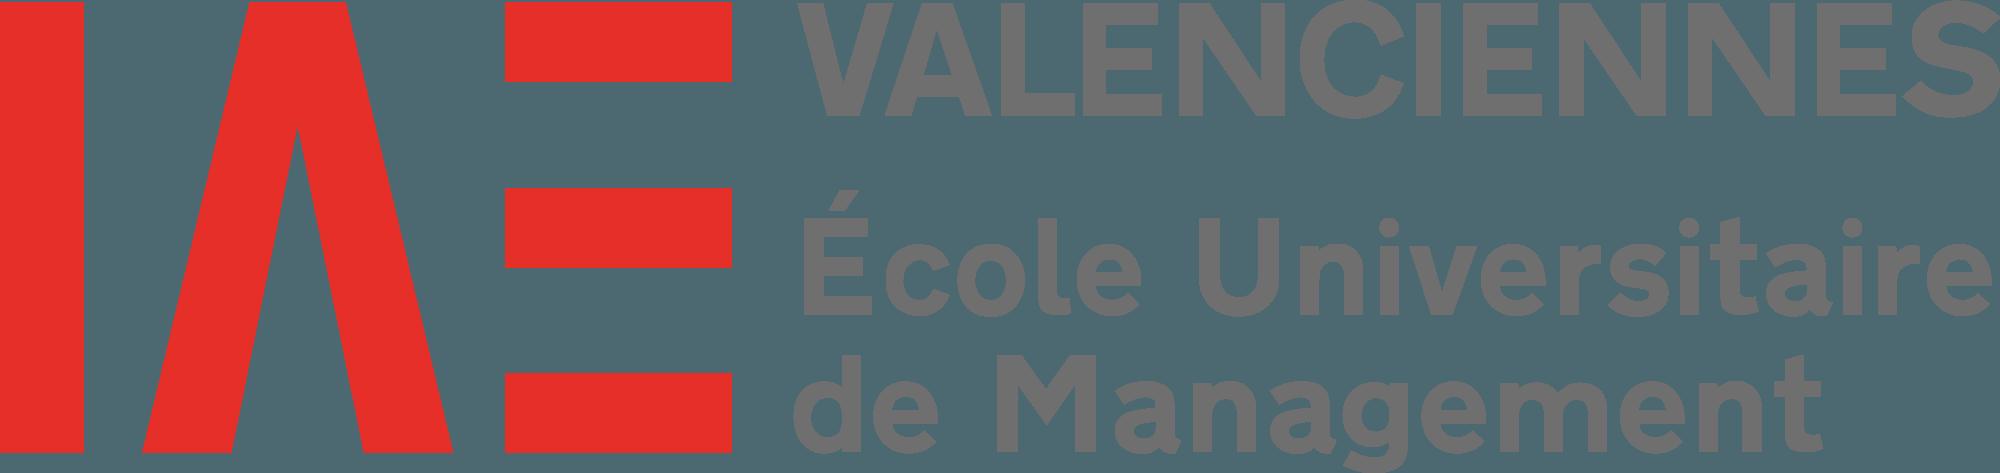 Interview de lucie debliqui dipl m e iae et ambassadrice - Logo valenciennes ...